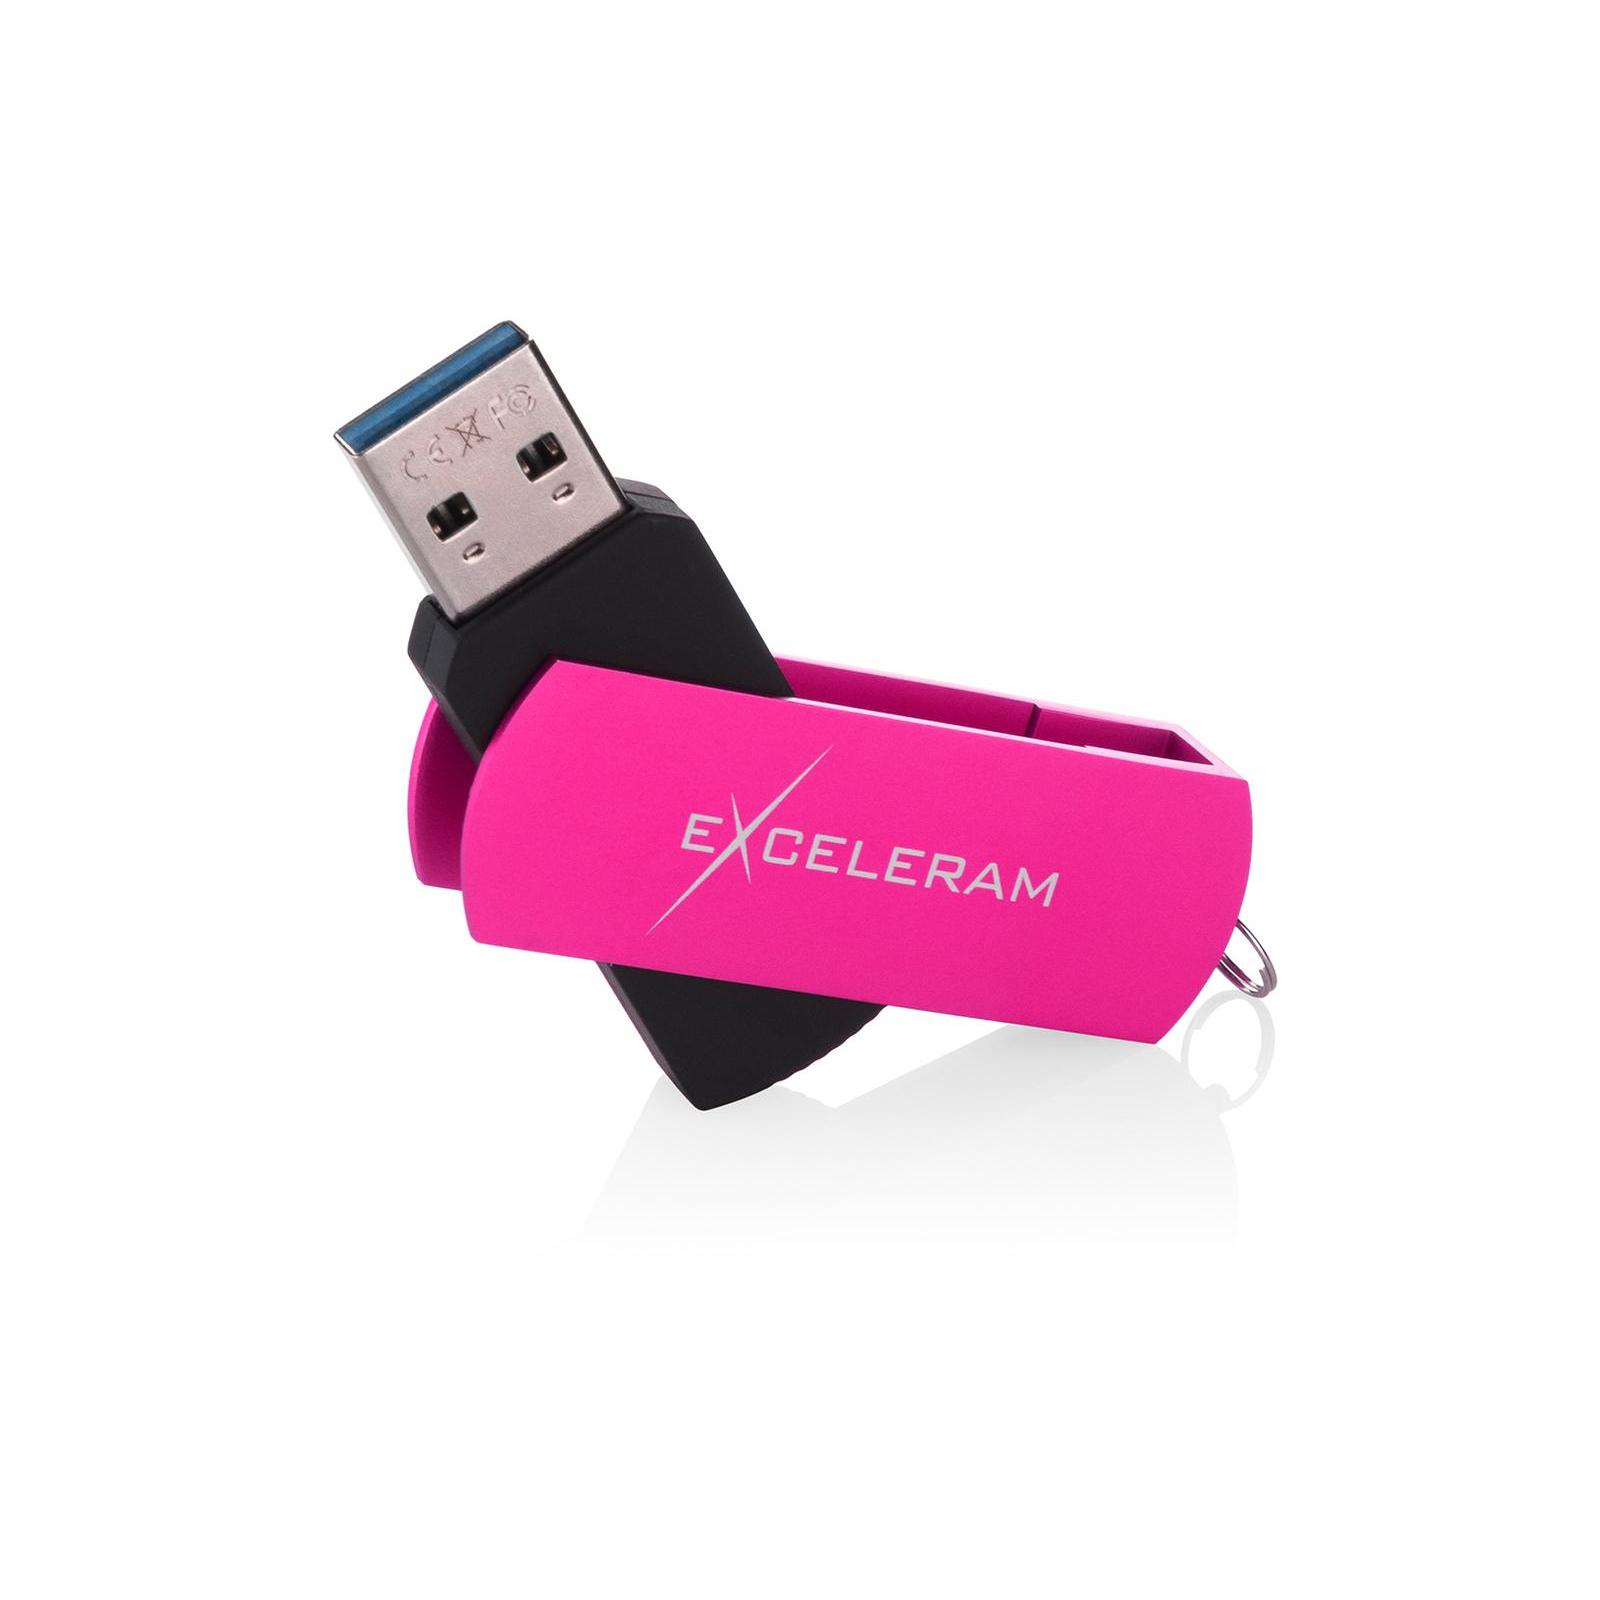 USB флеш накопитель eXceleram 64GB P2 Series Silver/Black USB 3.1 Gen 1 (EXP2U3SIB64) изображение 3